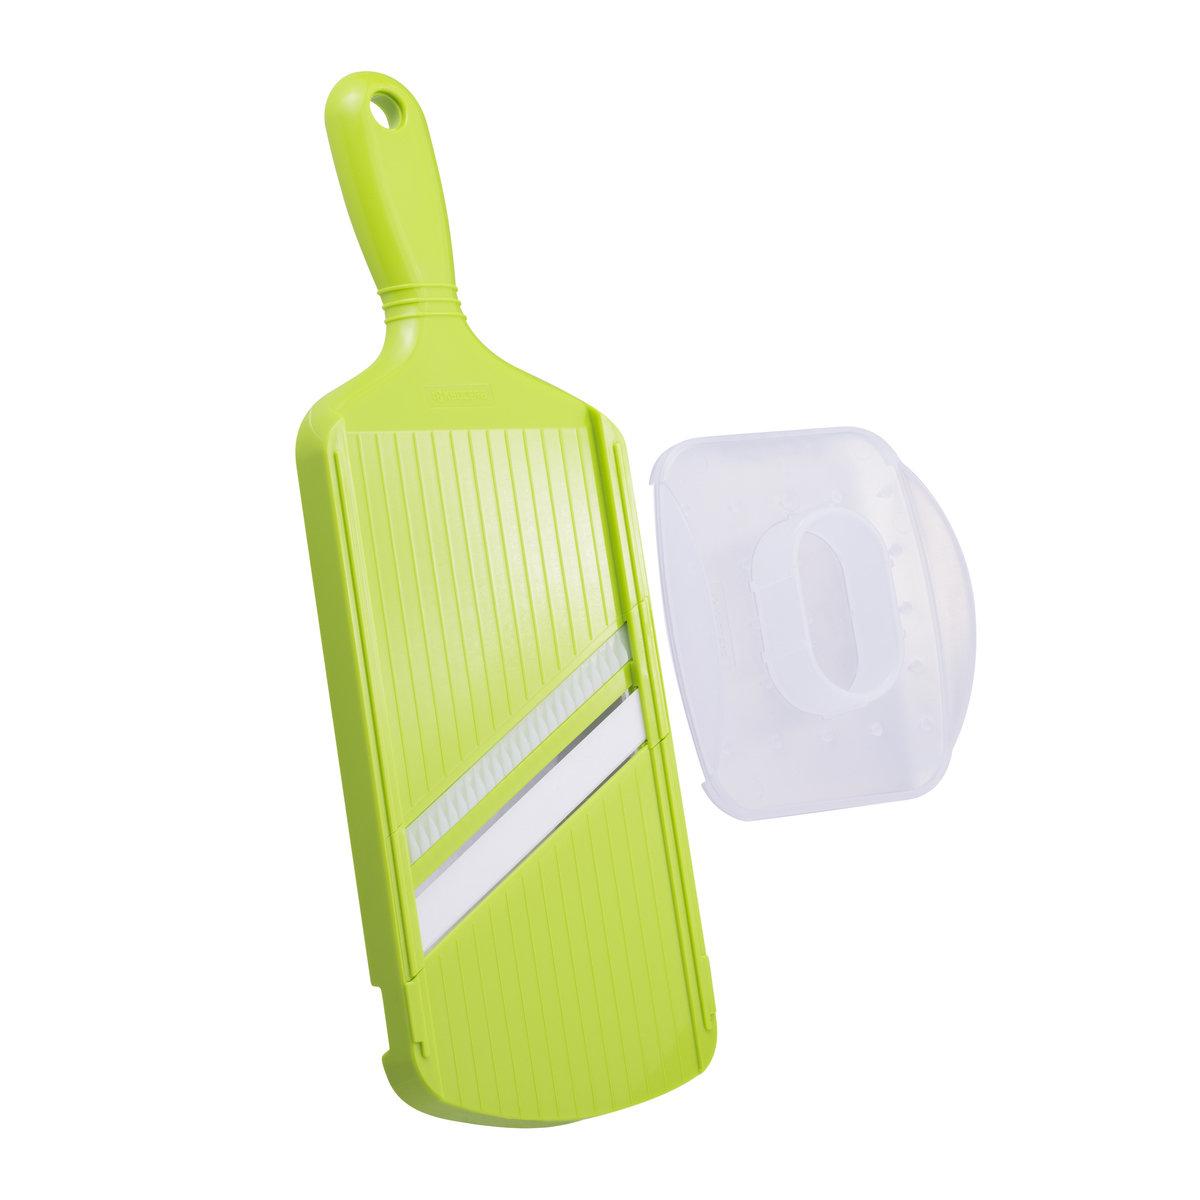 Ceramic Wide Julienne Slicer with Handguard (Green)